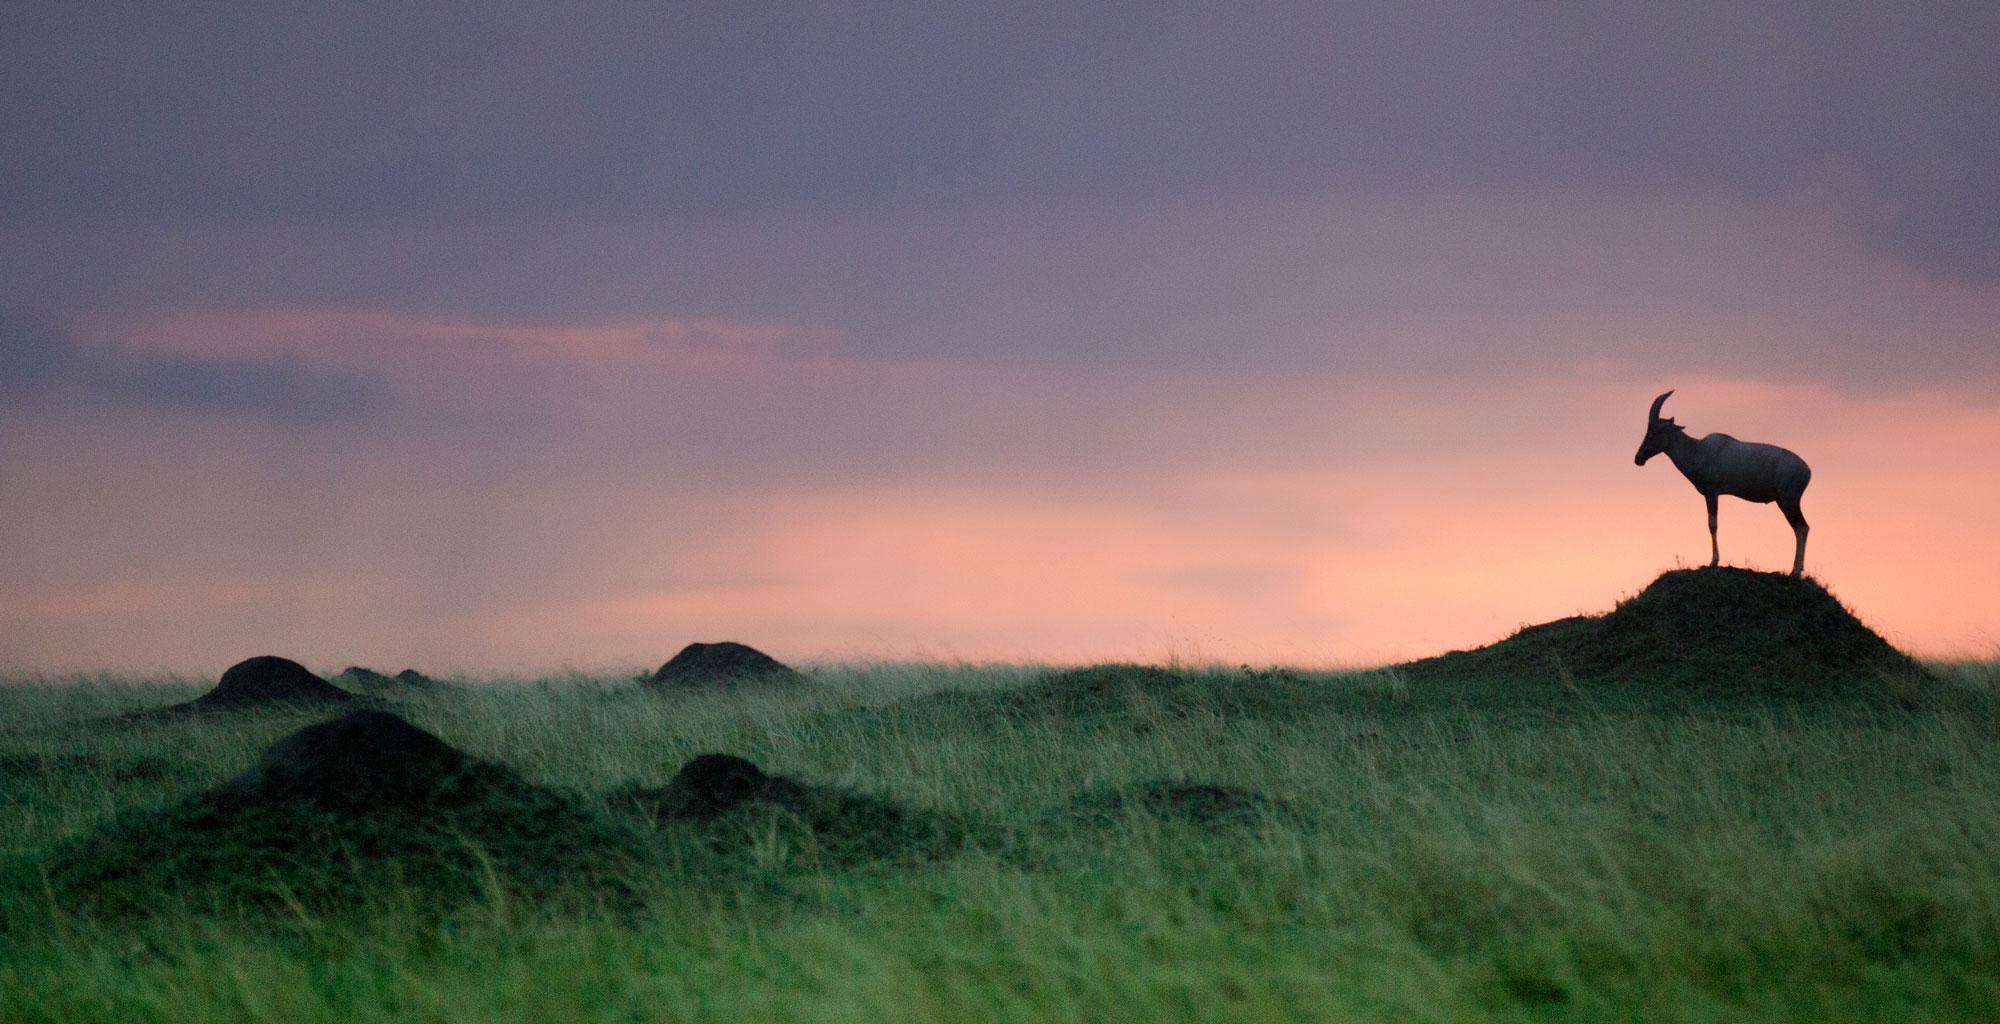 Kenya-Maasai-Mara-Sunset-Wildlife